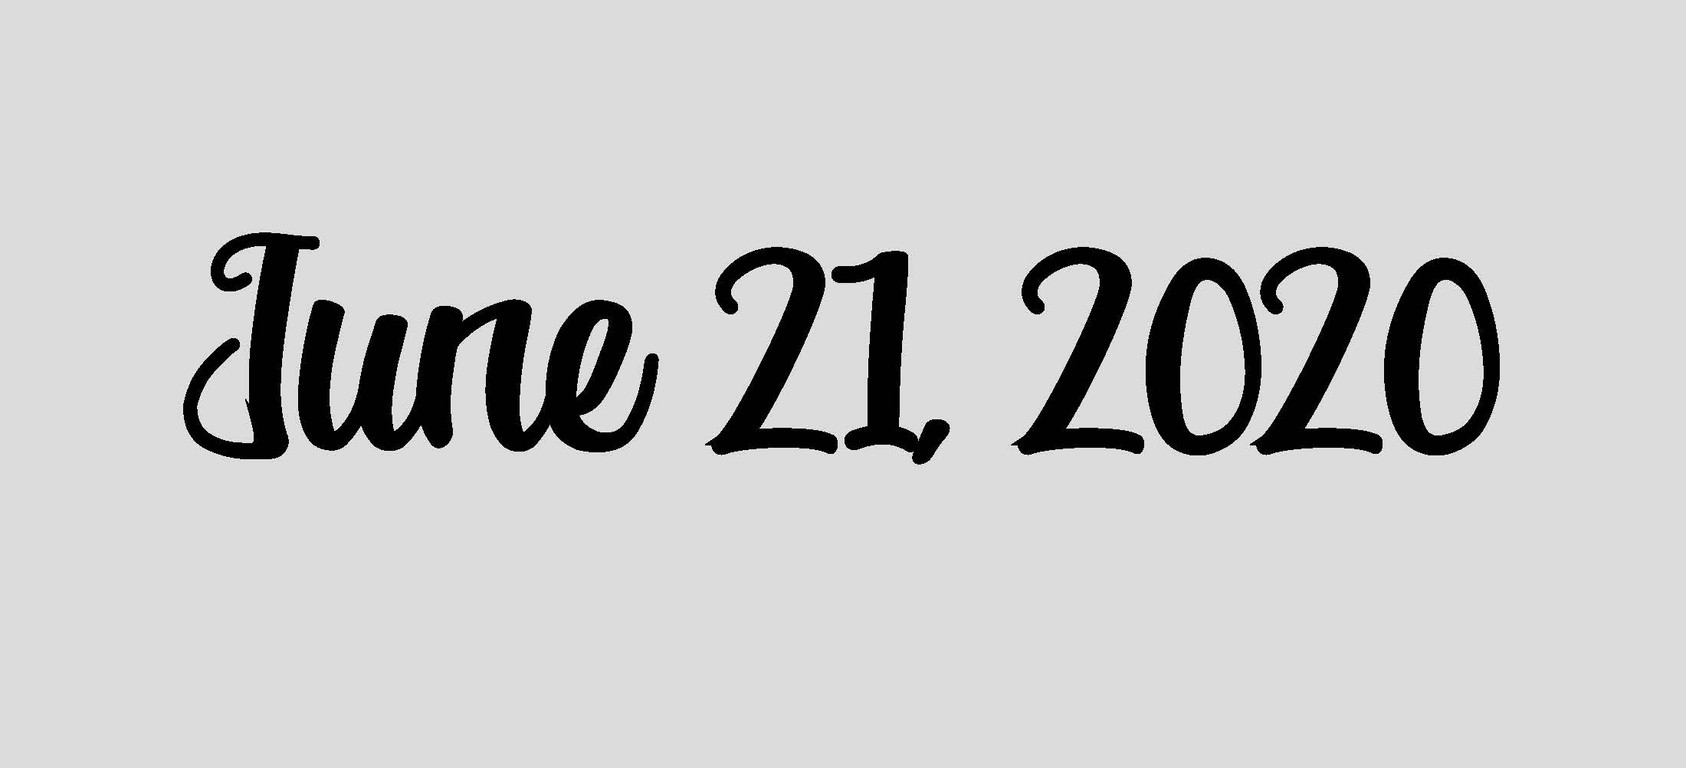 June 21, 2020